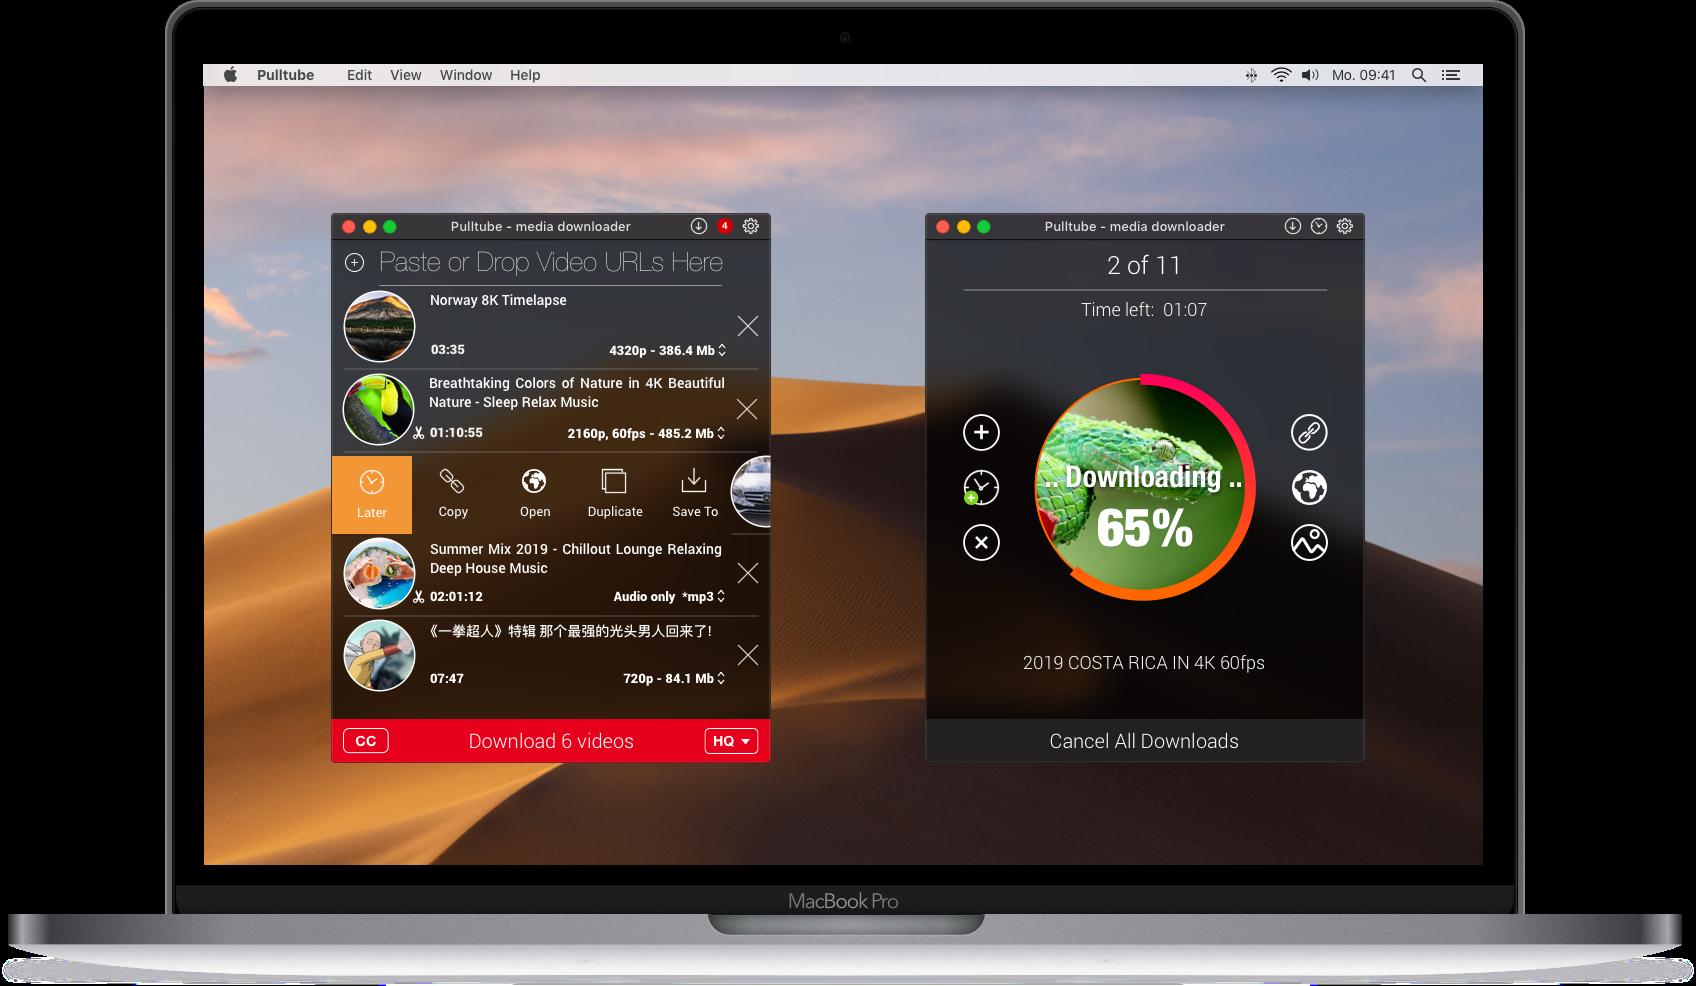 Pulltube - MacBook Pro - SAC Student Discount.png